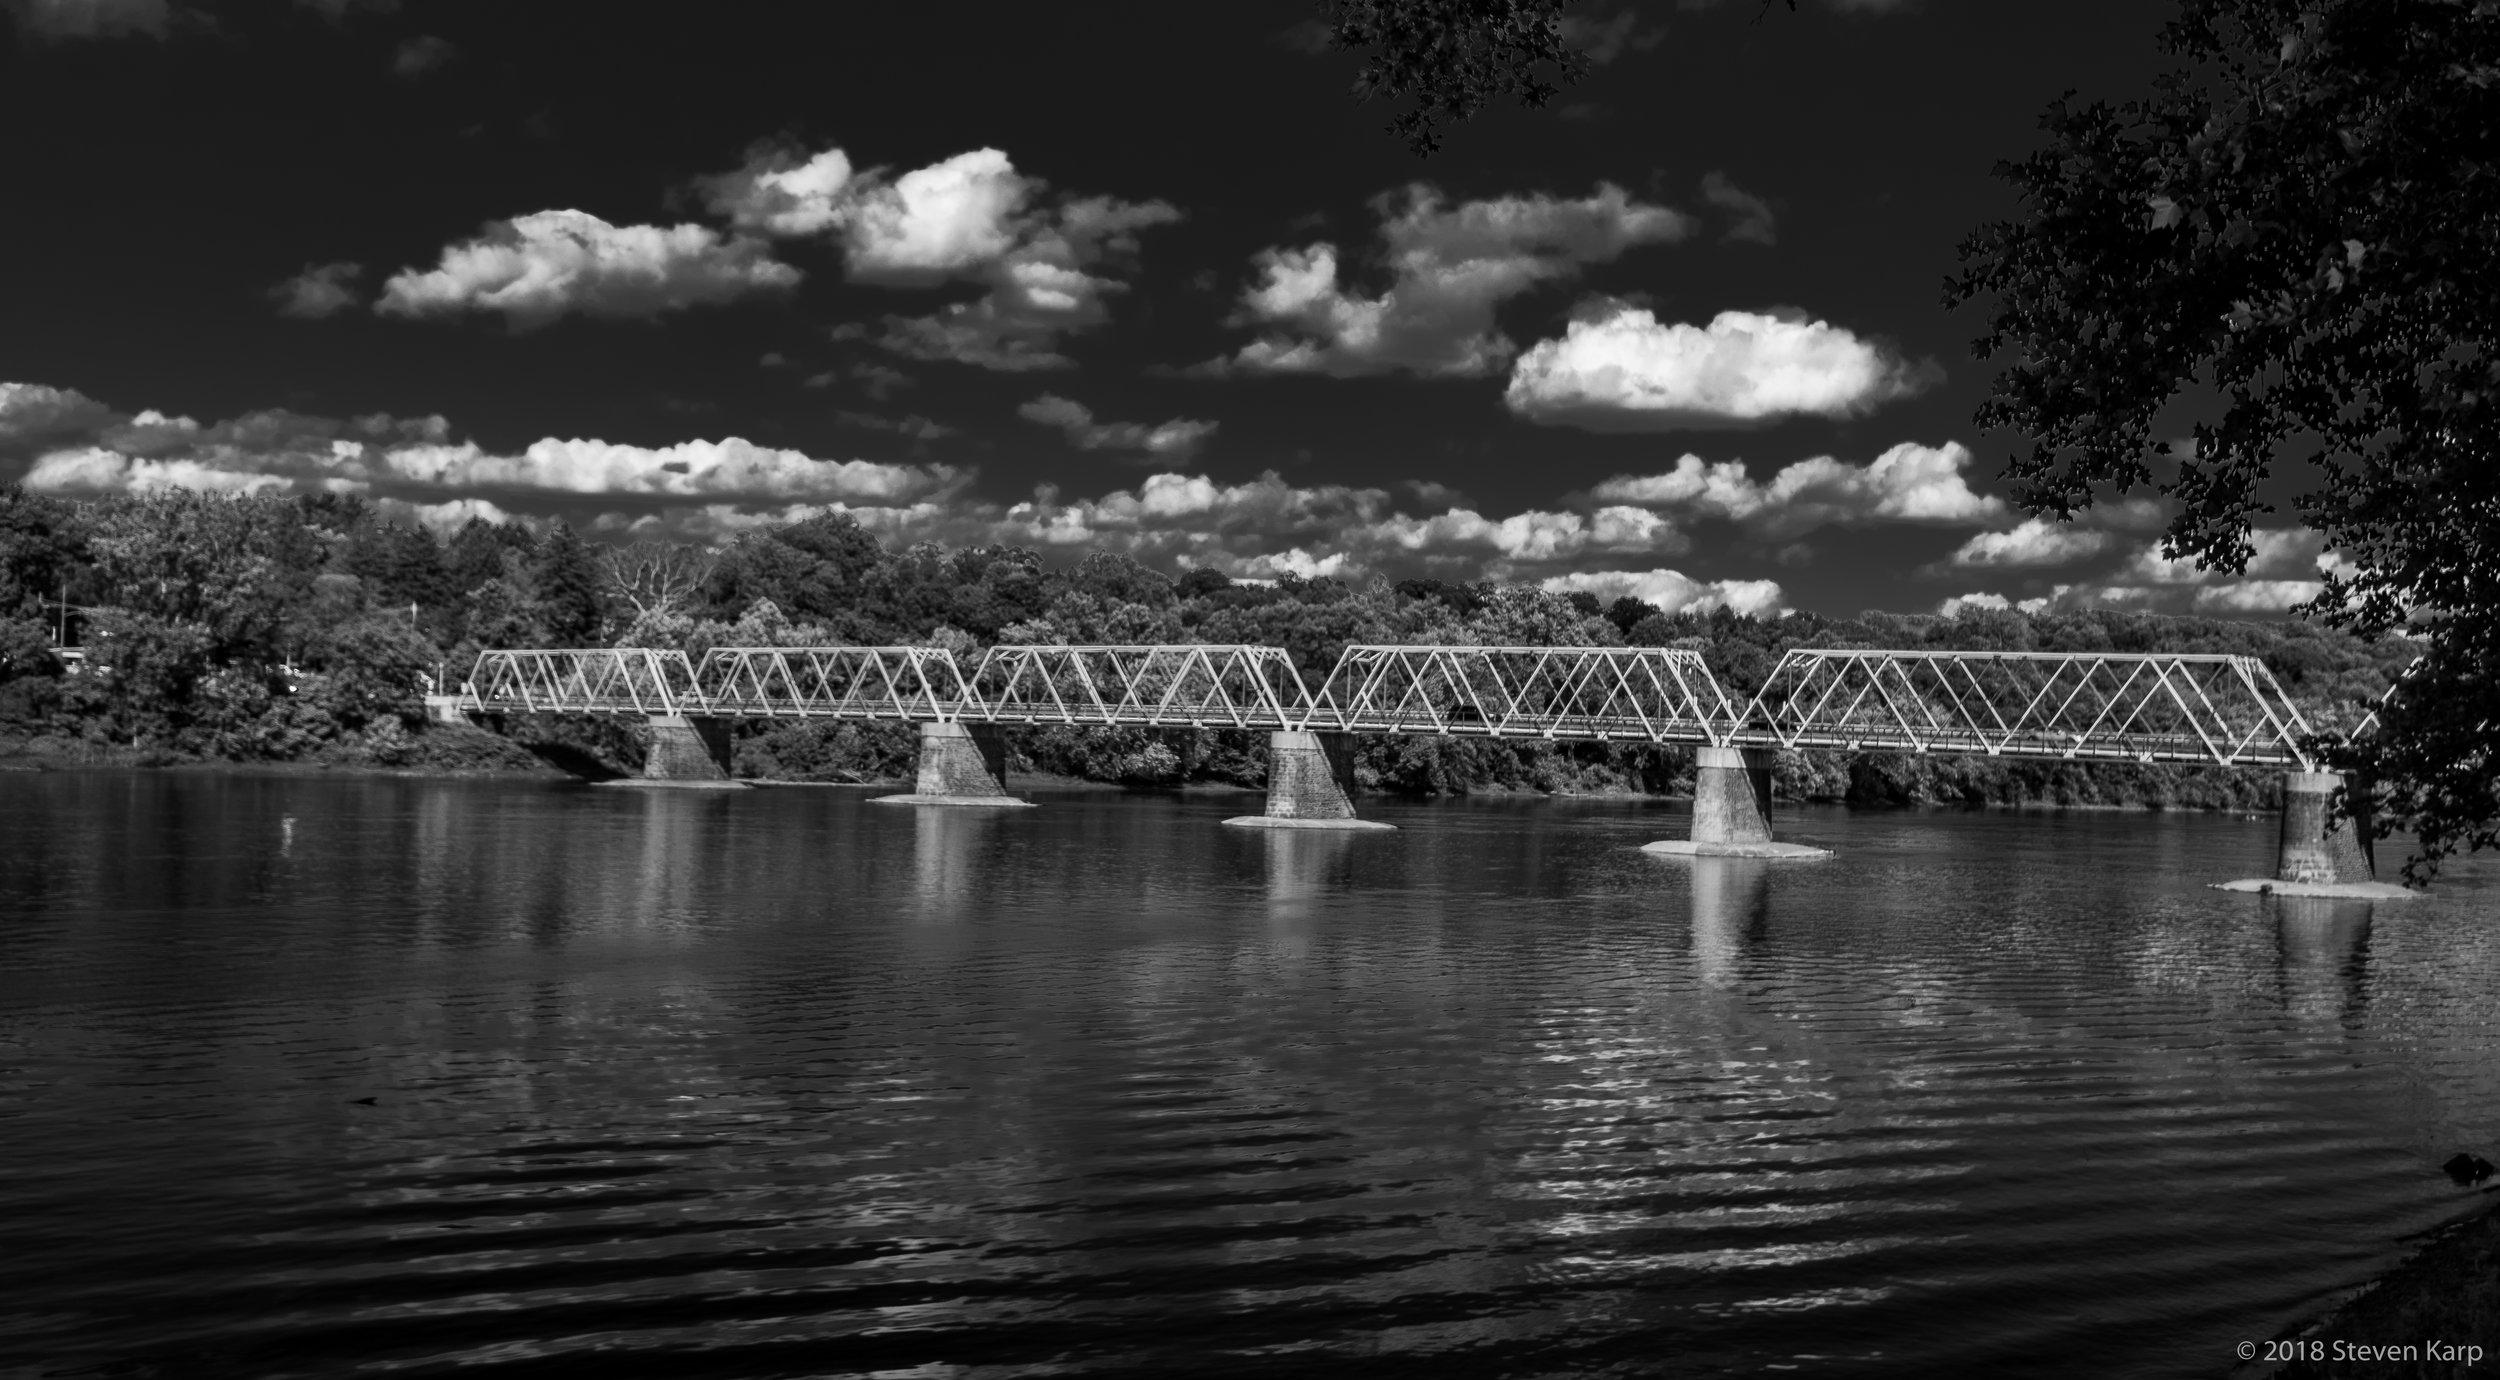 Bridge at Washington's Crossing